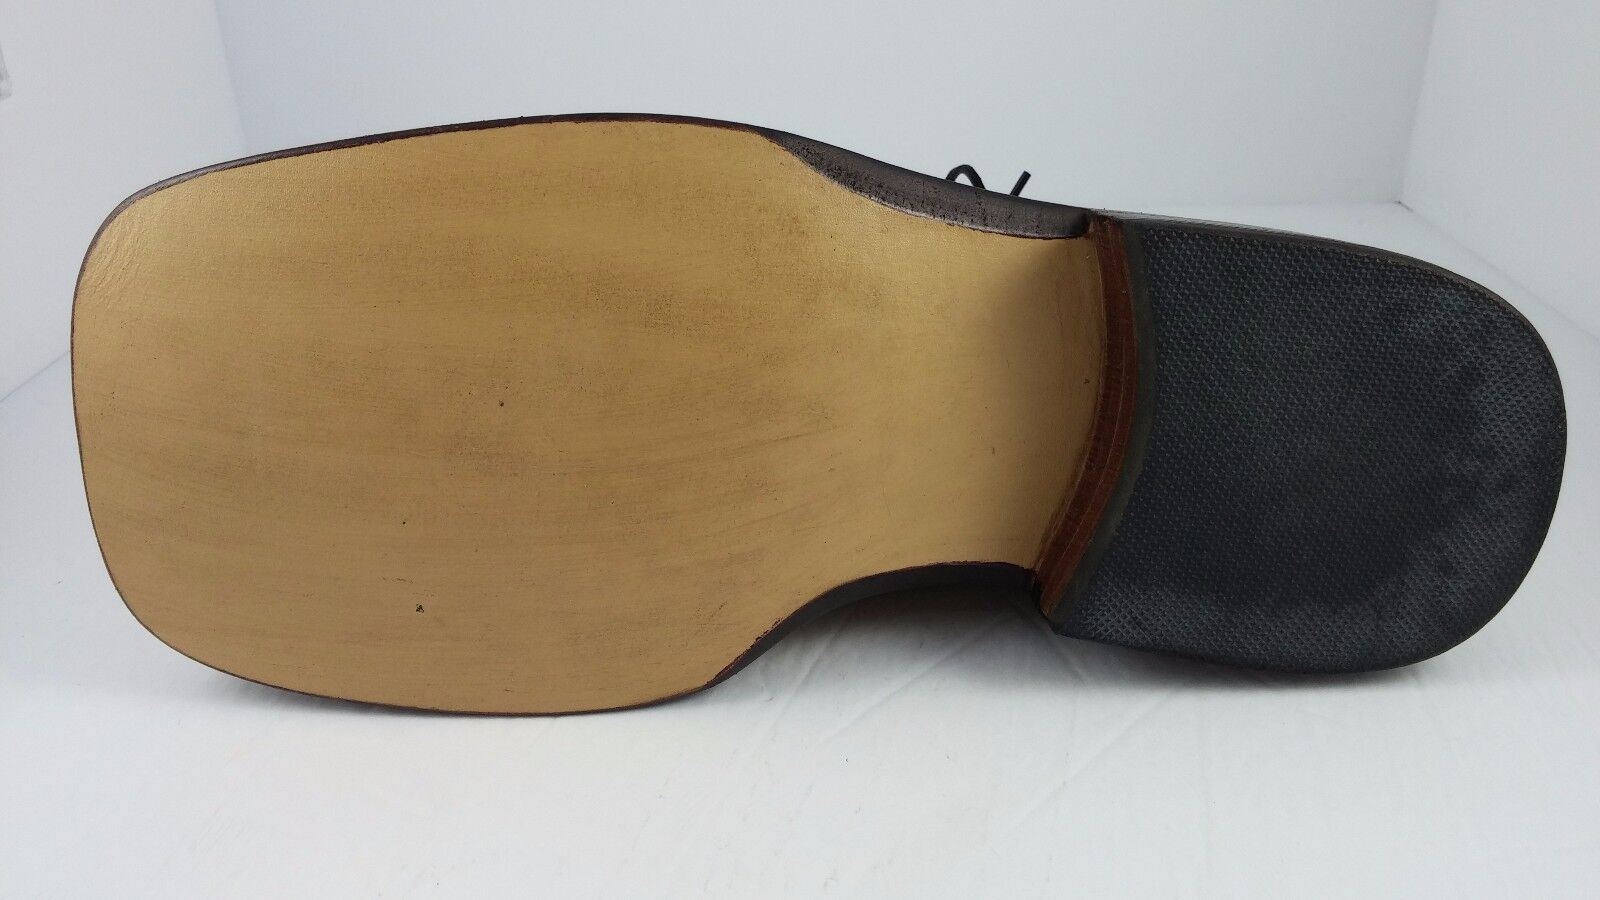 Bespoke Tan Pelle Benchmade Handmade Handmade Handmade Broad Square Toe Scarpe Pelle Sole Sz 8D c2f84f